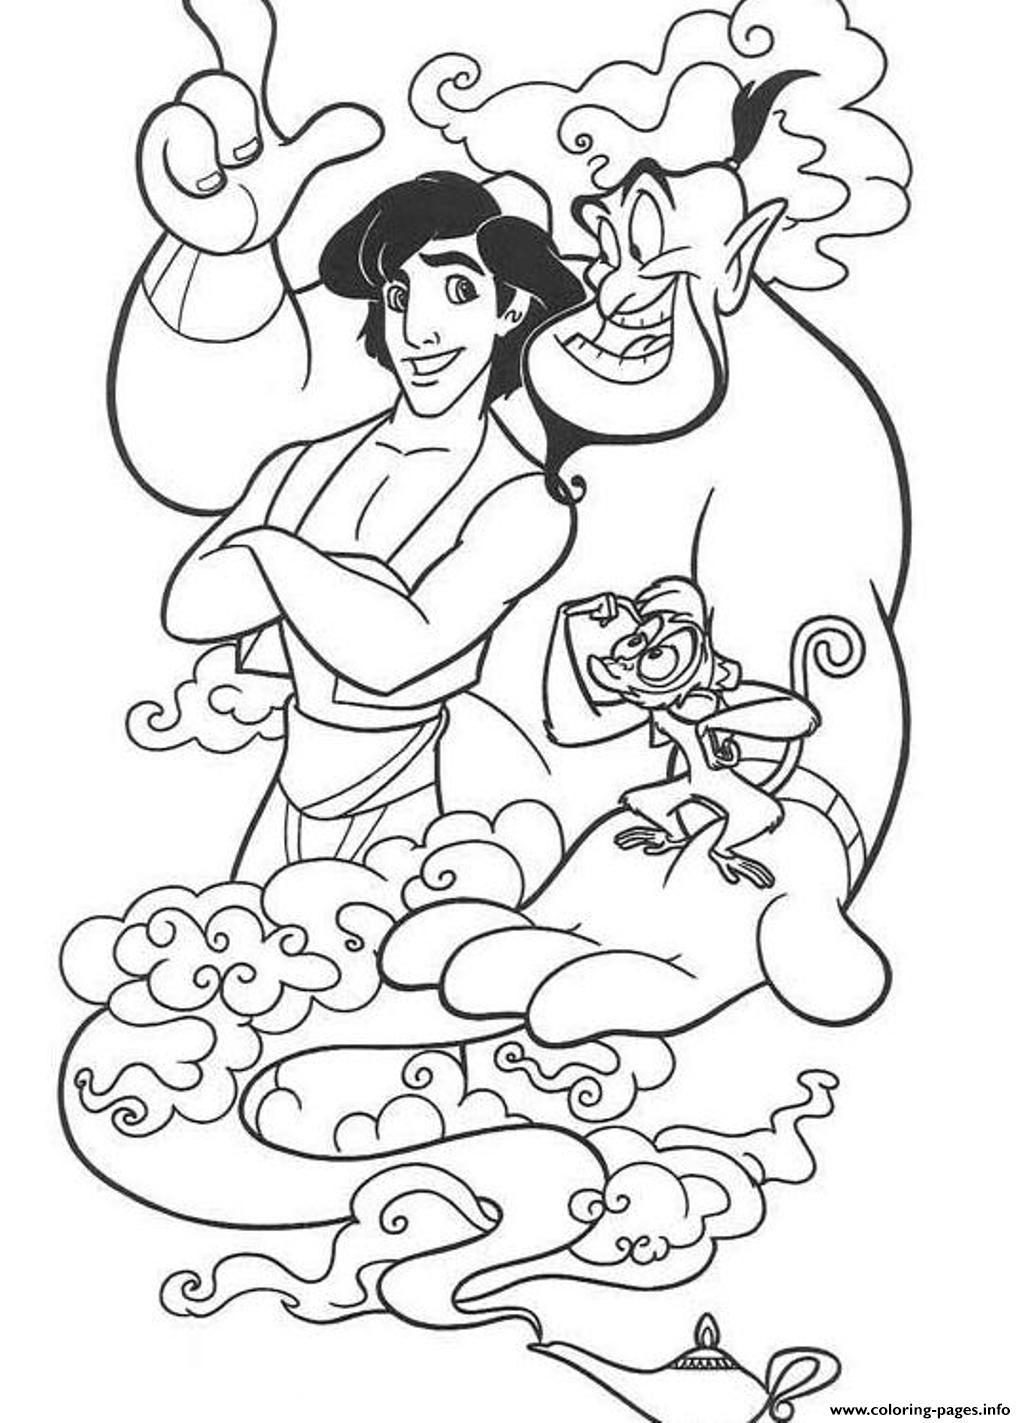 Print Abu Genie And Aladdin Disney7665 Coloring Pages Disney Coloring Sheets Free Disney Coloring Pages Disney Coloring Pages